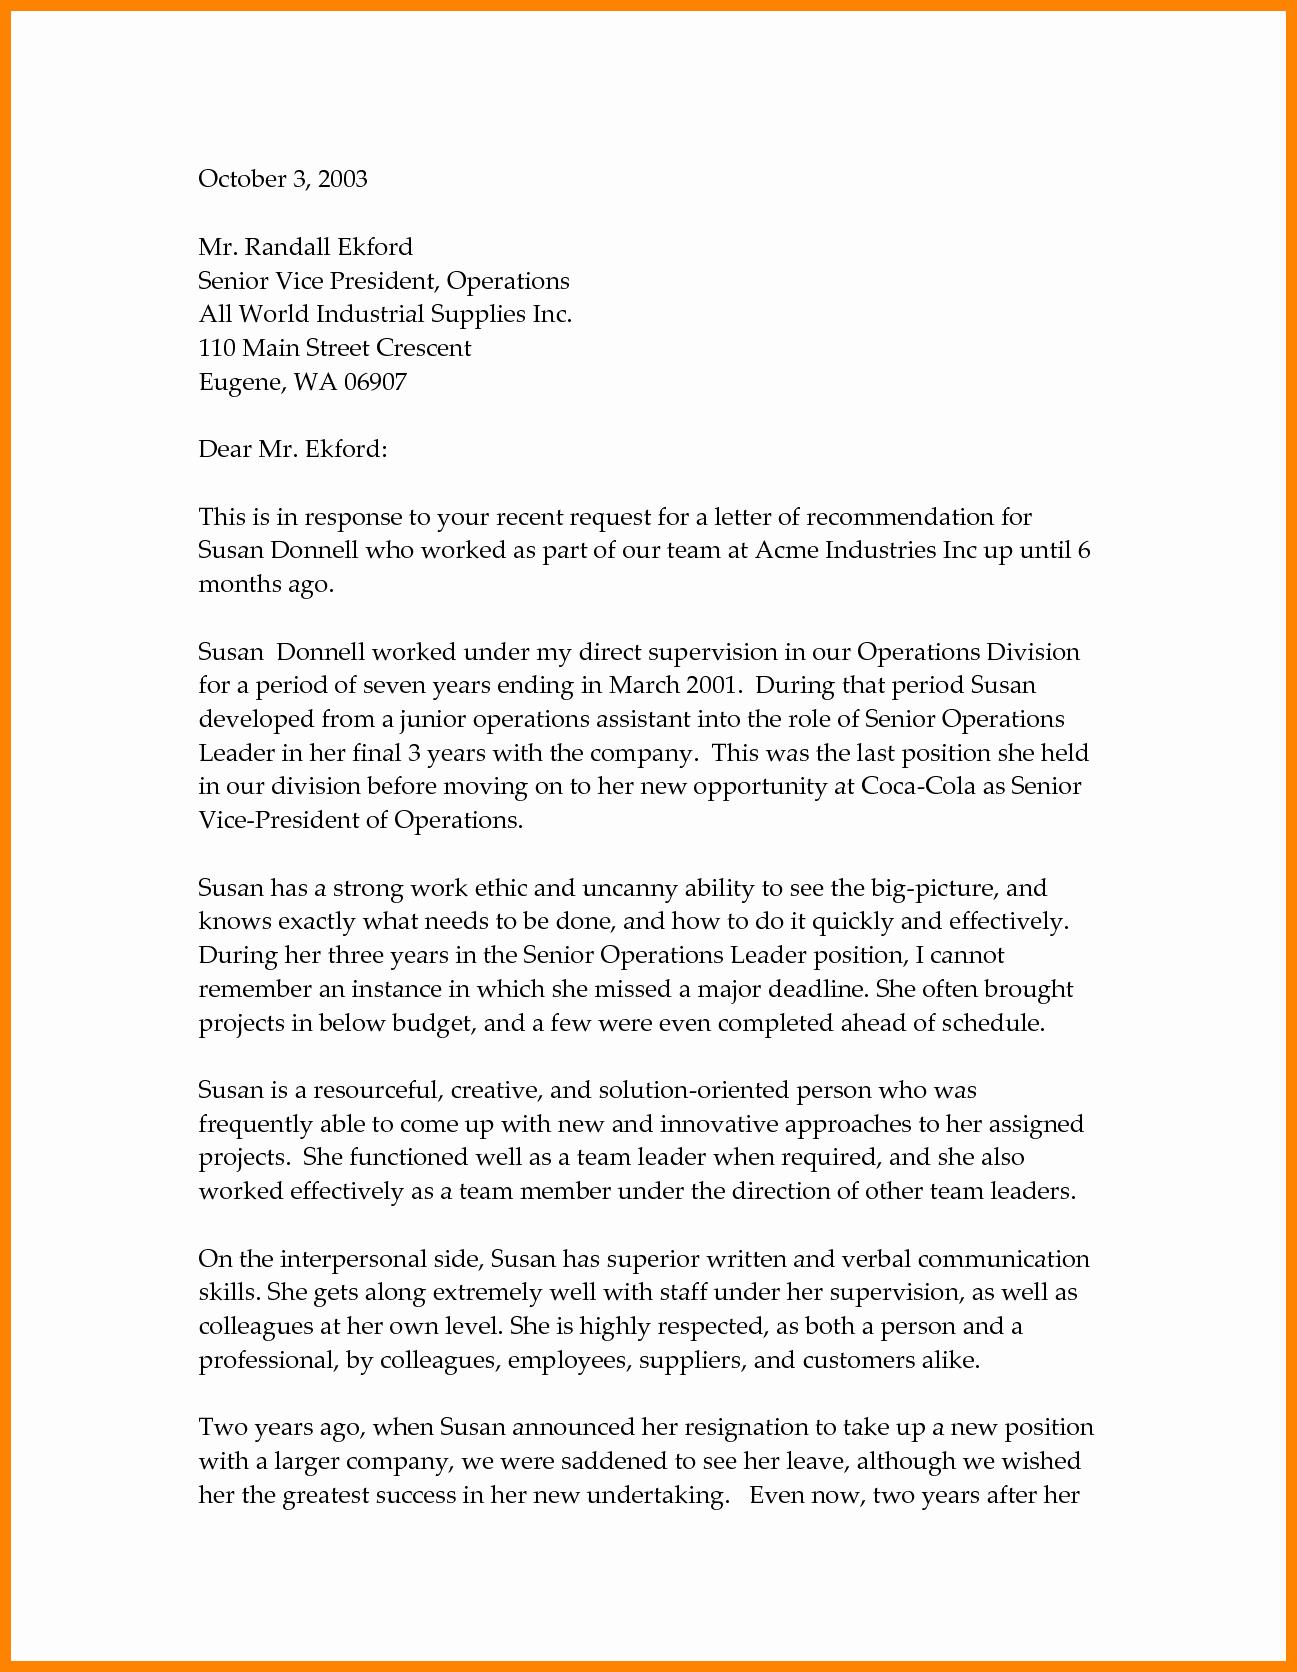 Professional Reference Letter Template Unique Resignation Letter Template Businessballs